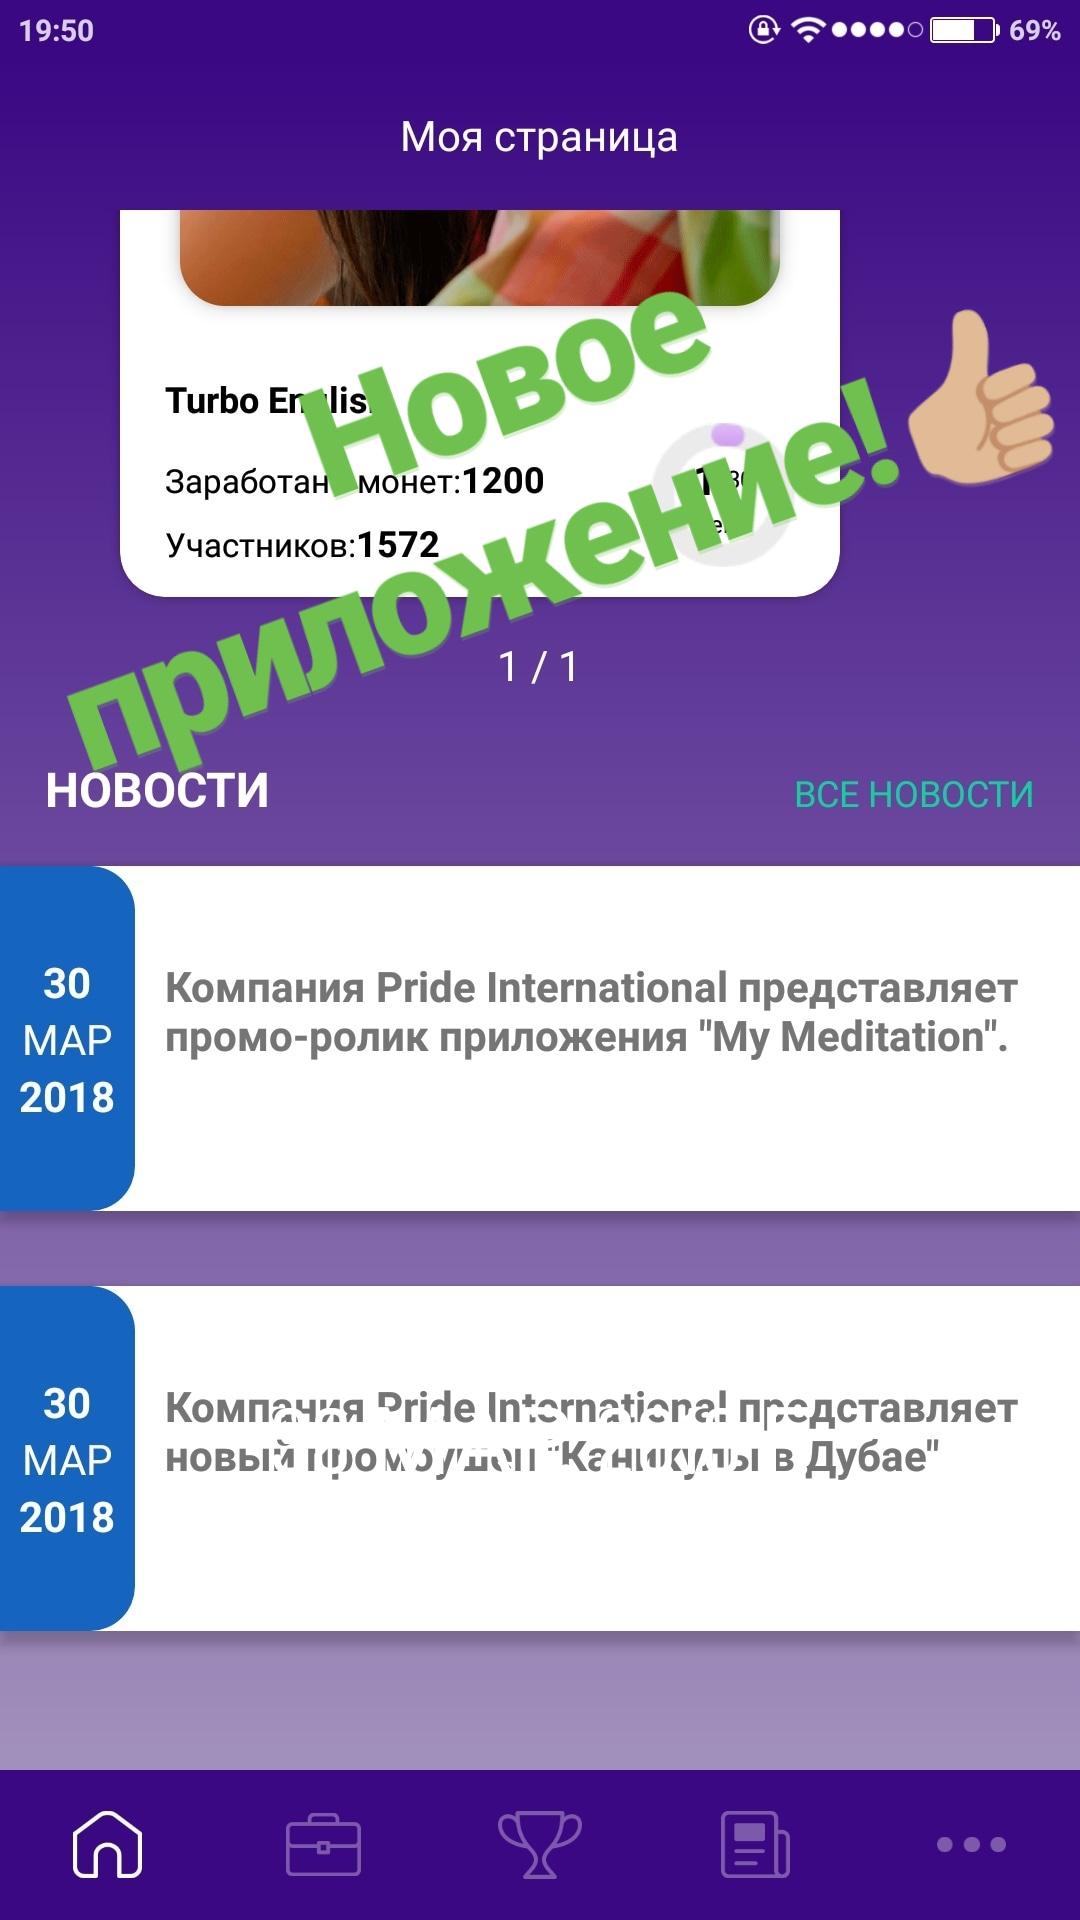 IMG_20180401_043805_865.jpg